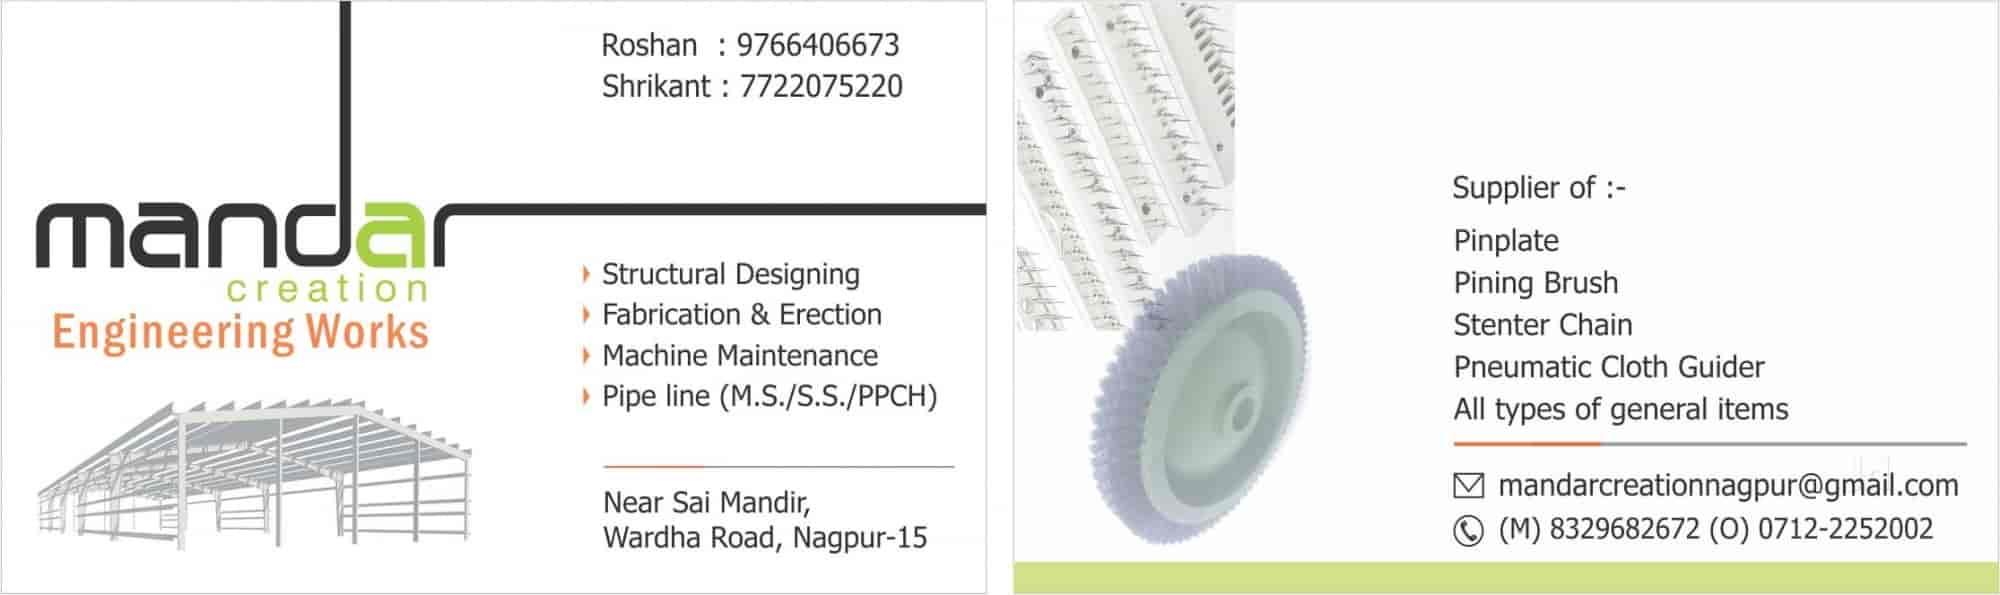 Mandar Creation Engineering Works Photos, Khamla, Nagpur